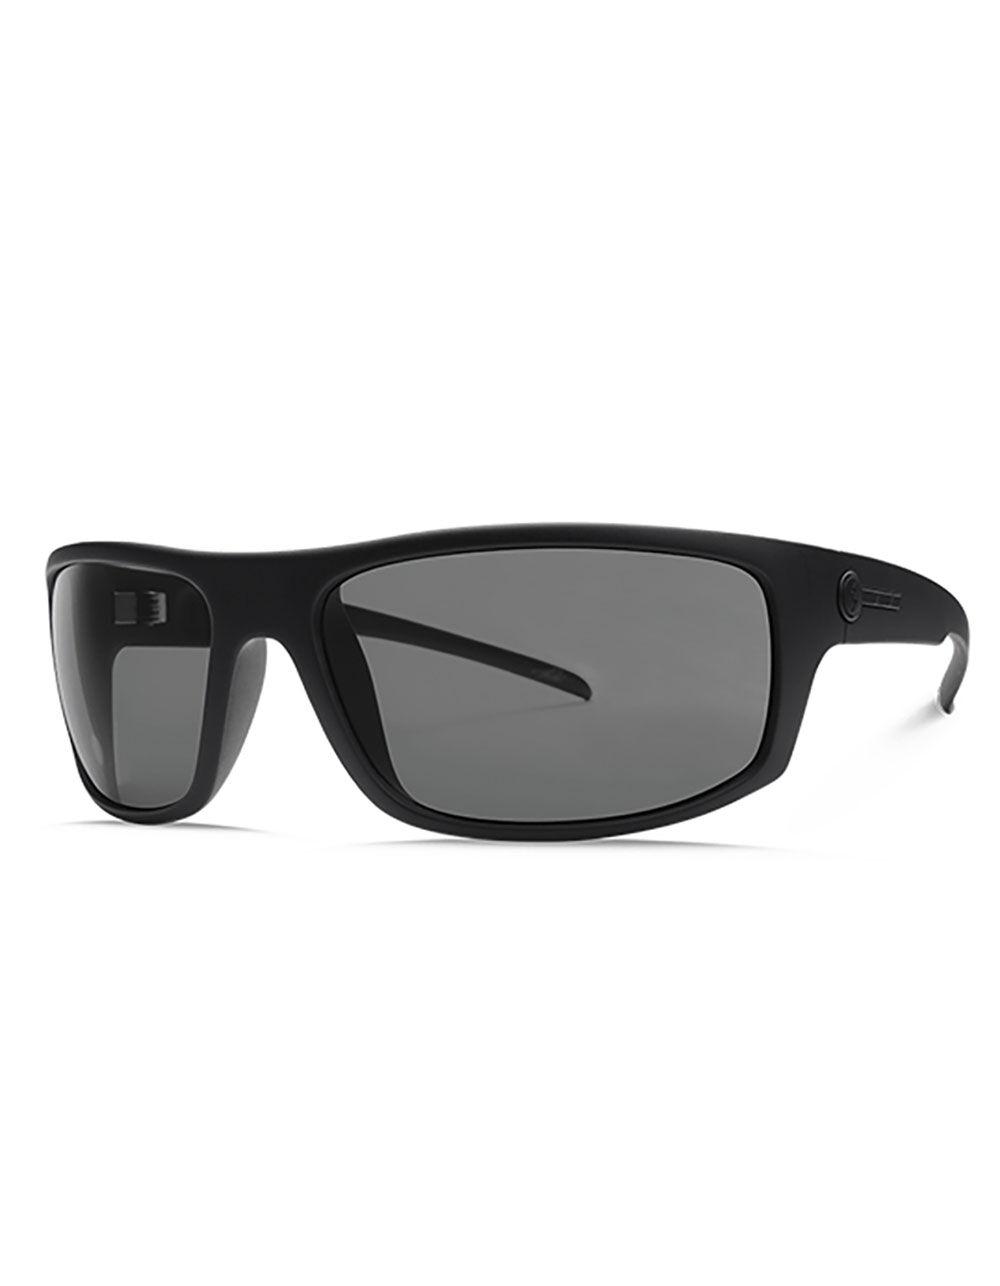 ELECTRIC Tech One Polarized Sunglasses